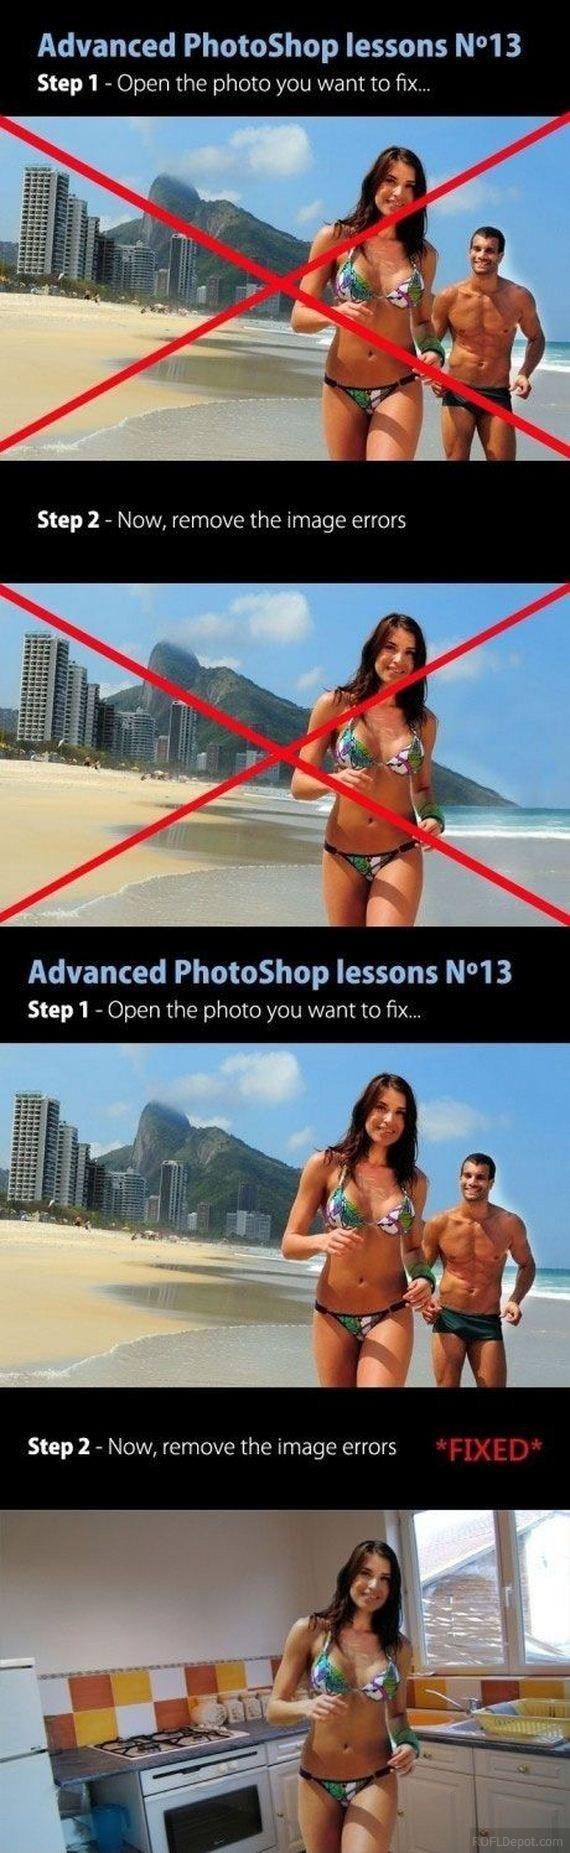 "Kitchen pls. . Advanced Photoshop lessons 3 Step 1 "" Open the photo you went to fic, Advanced Photoshop lessons Steps - Open the photo you want to fic, Kitchen pls Advanced Photoshop lessons 3 Step 1 "" Open the photo you went to fic Steps - want"